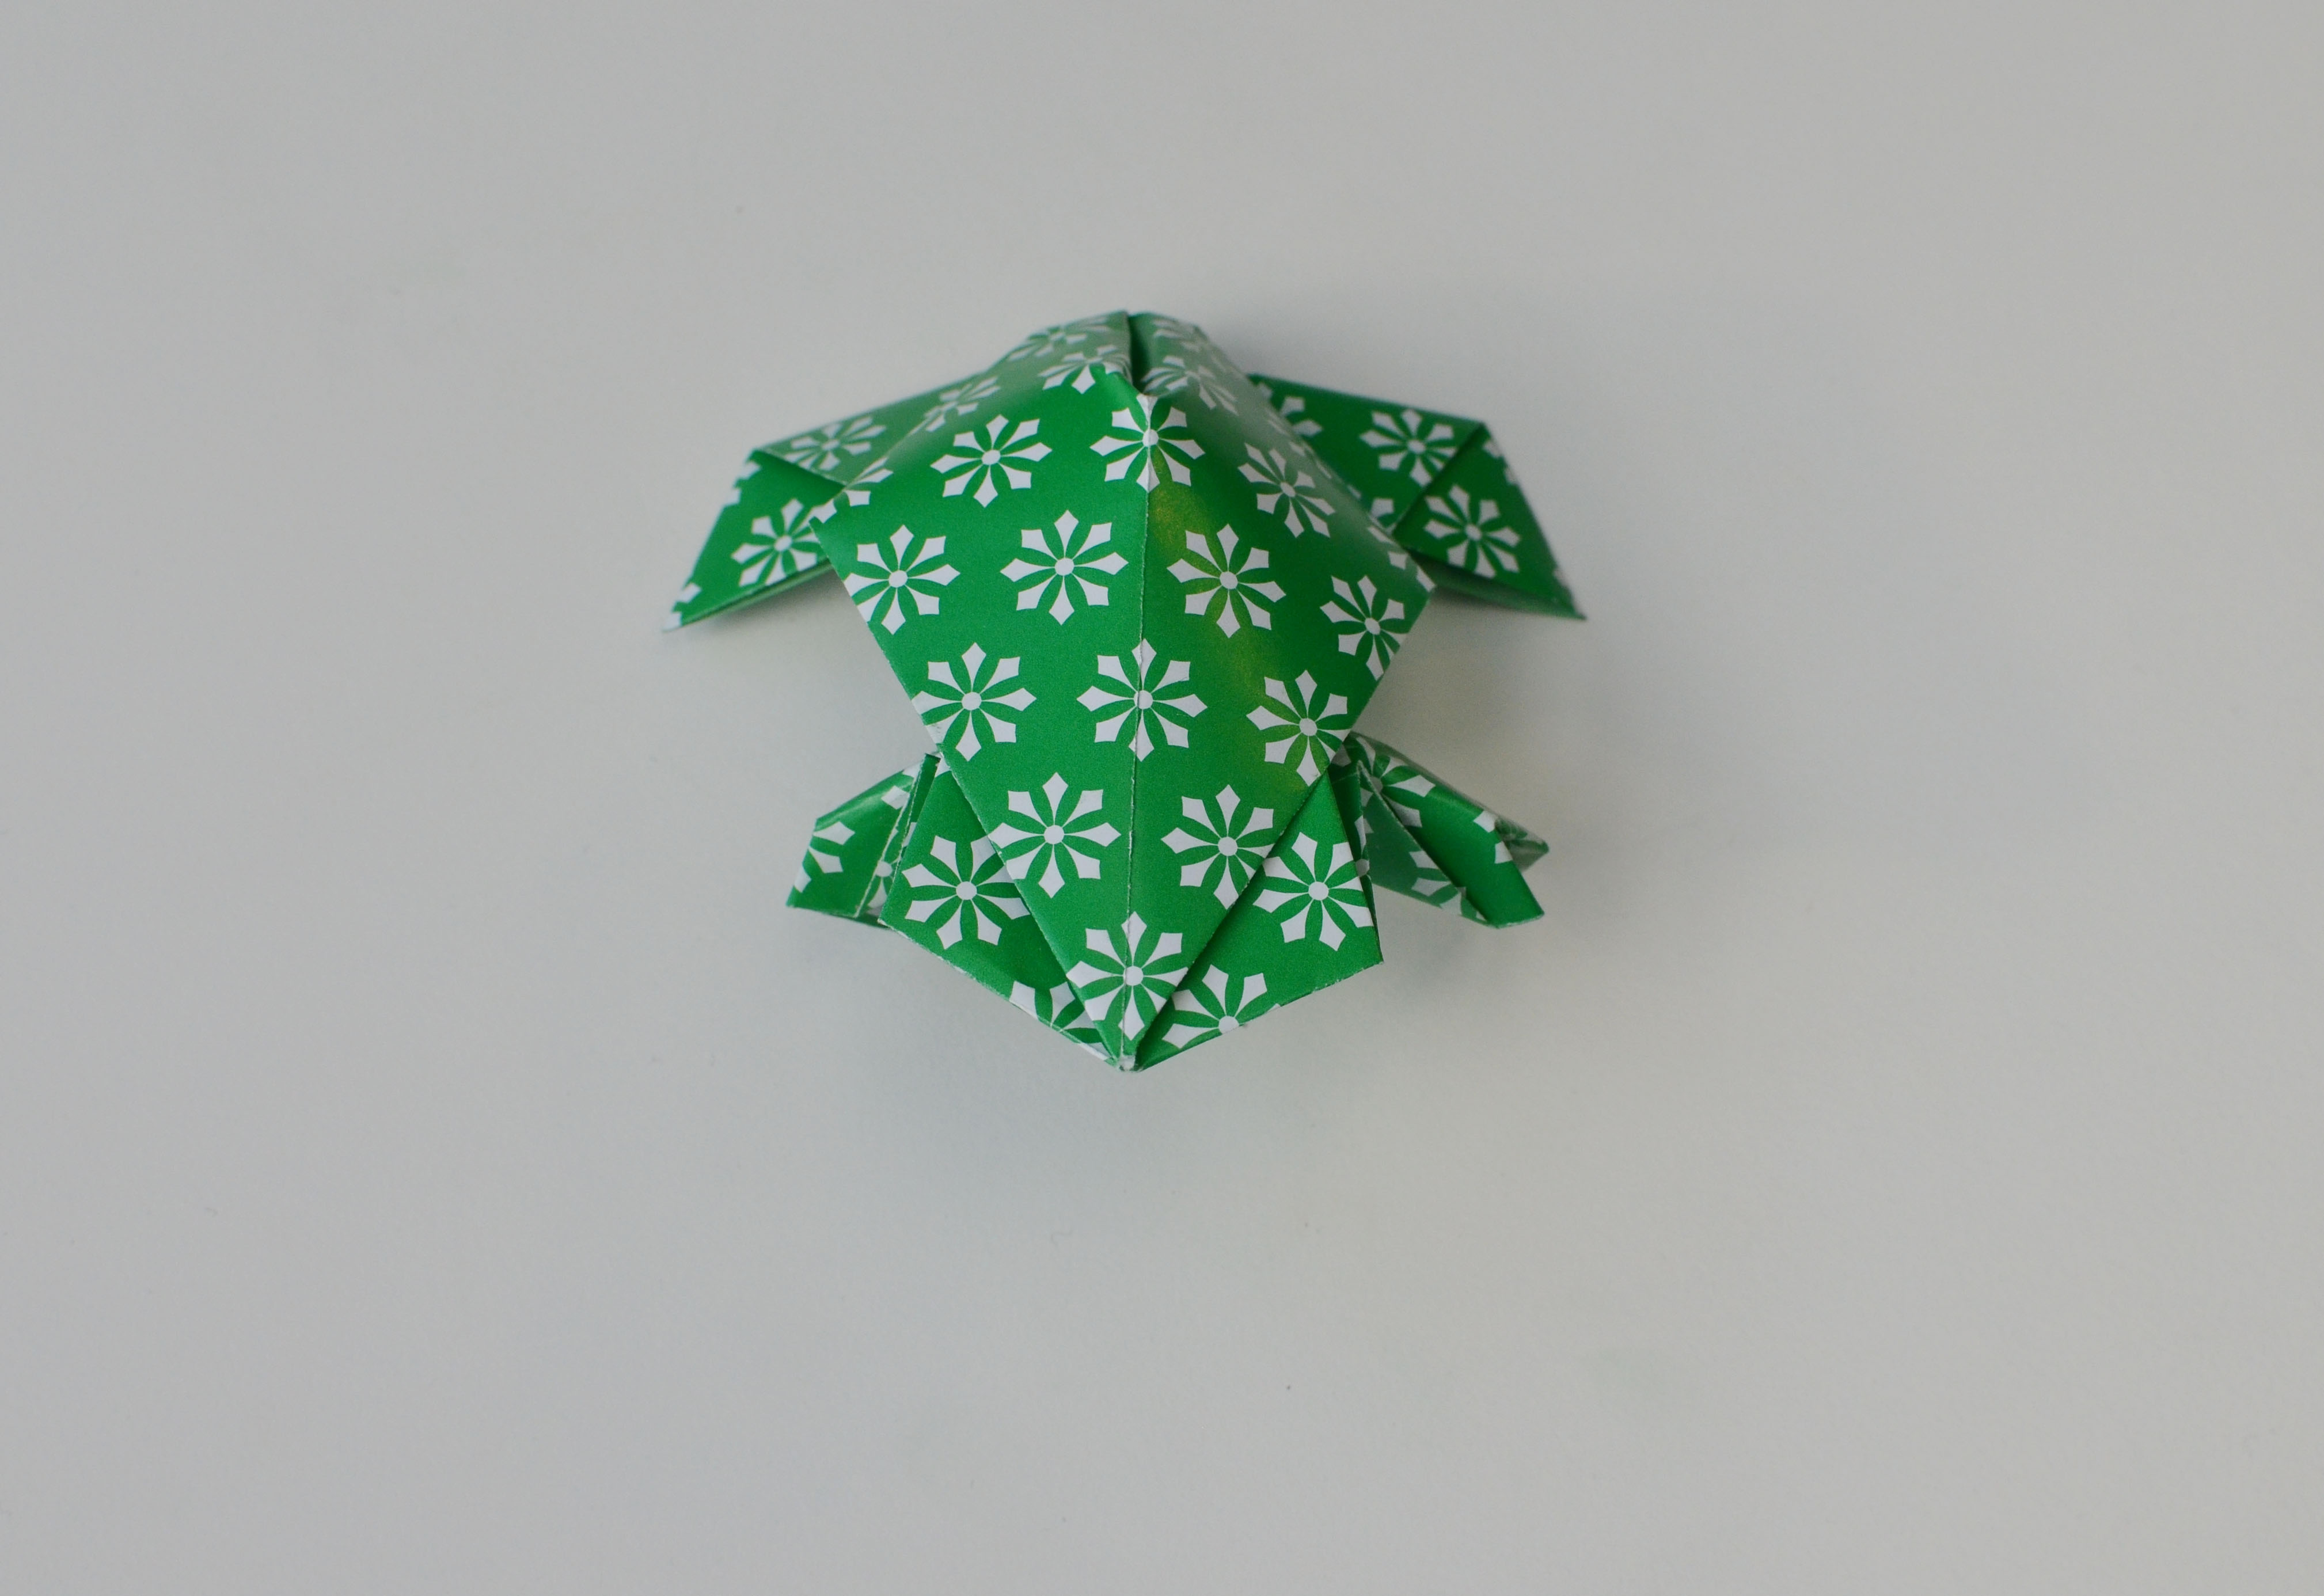 braincrafts_frog_origami_pt72.jpg